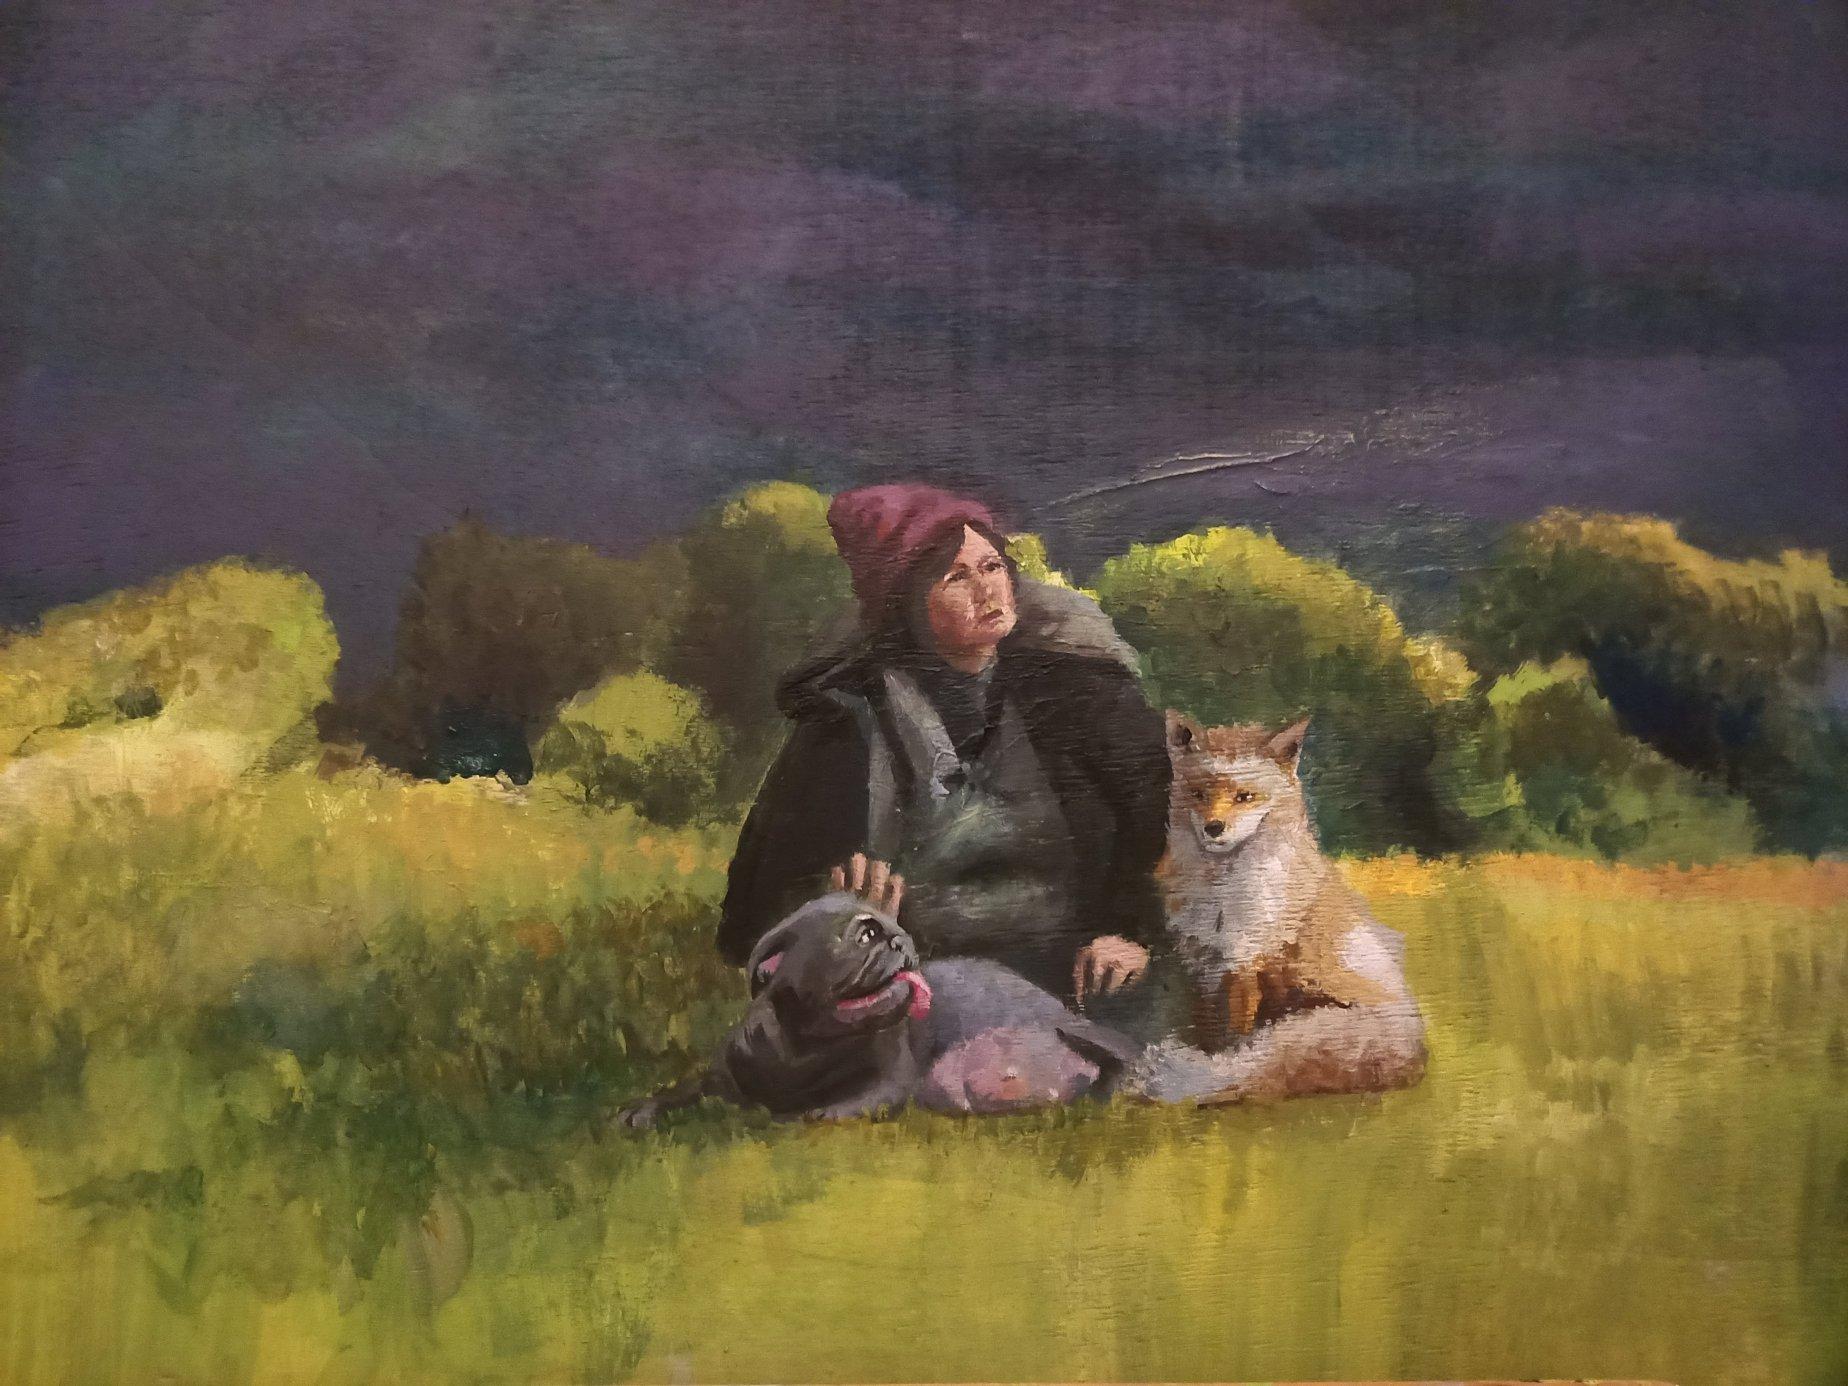 Perra, guarra y zorra (2021) - Julia Rodriguez Dominguez - Rodo